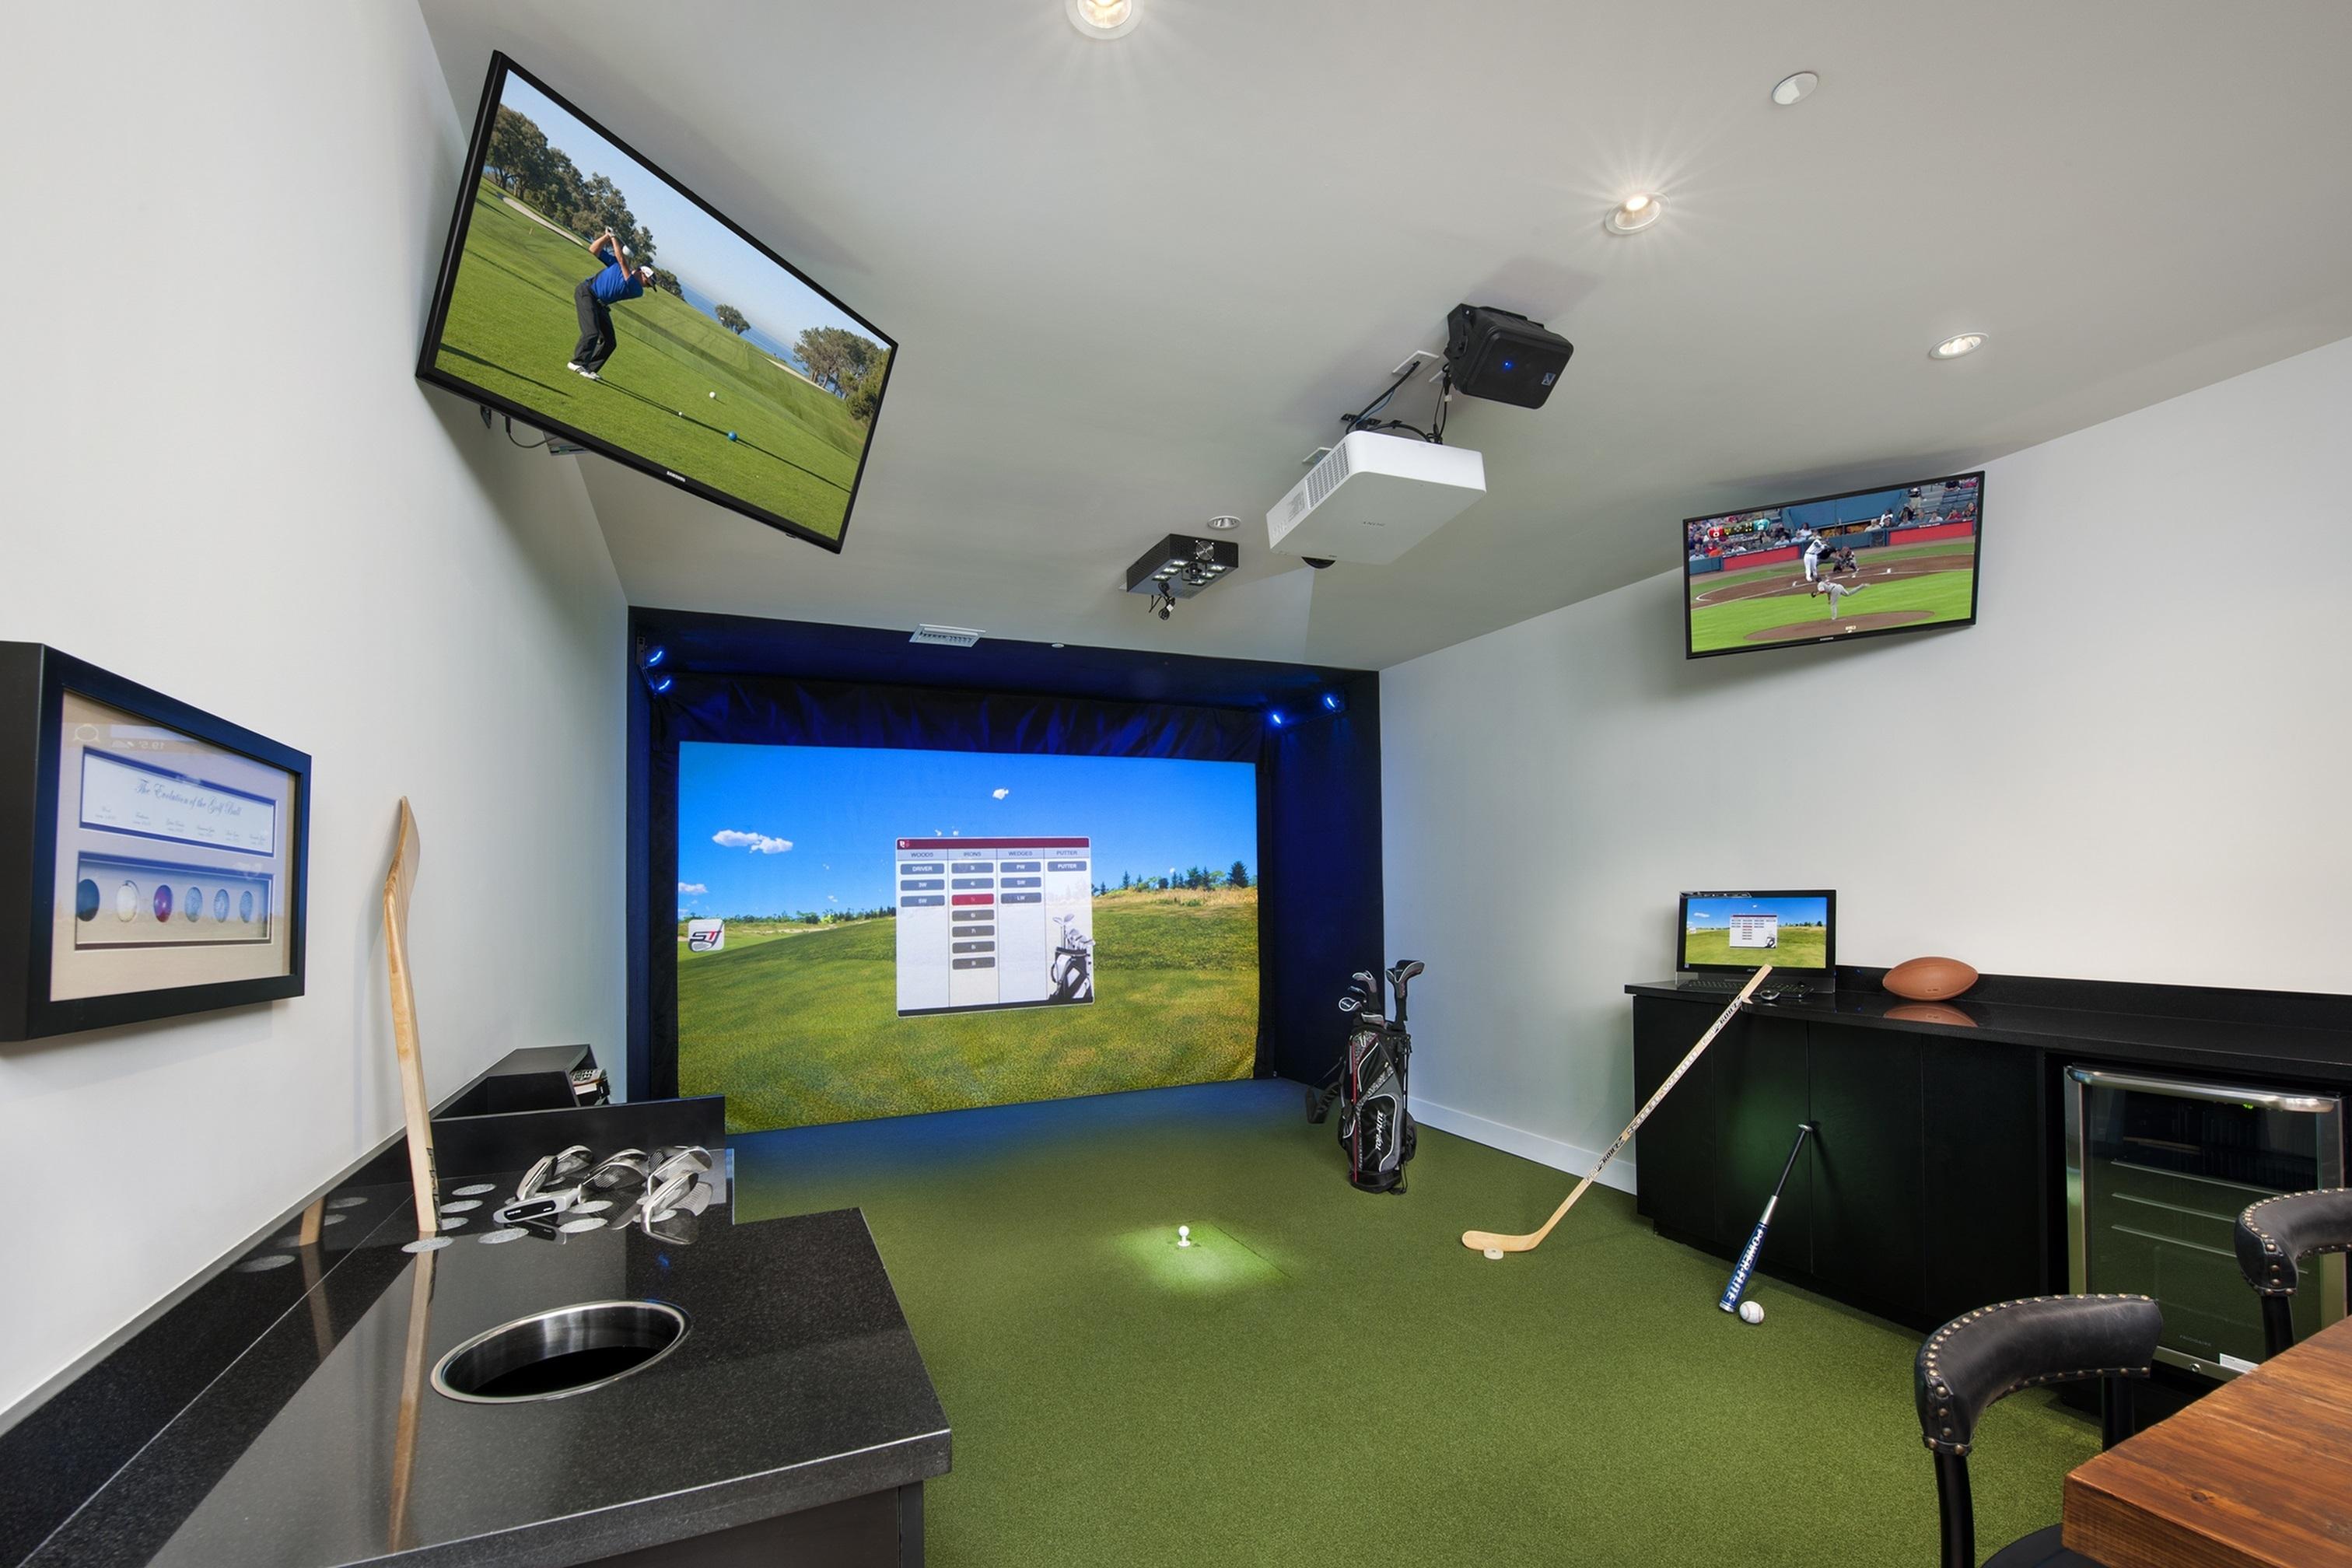 Indoor multi-sport simulator for golf, hockey, baseball, football, soccer and more